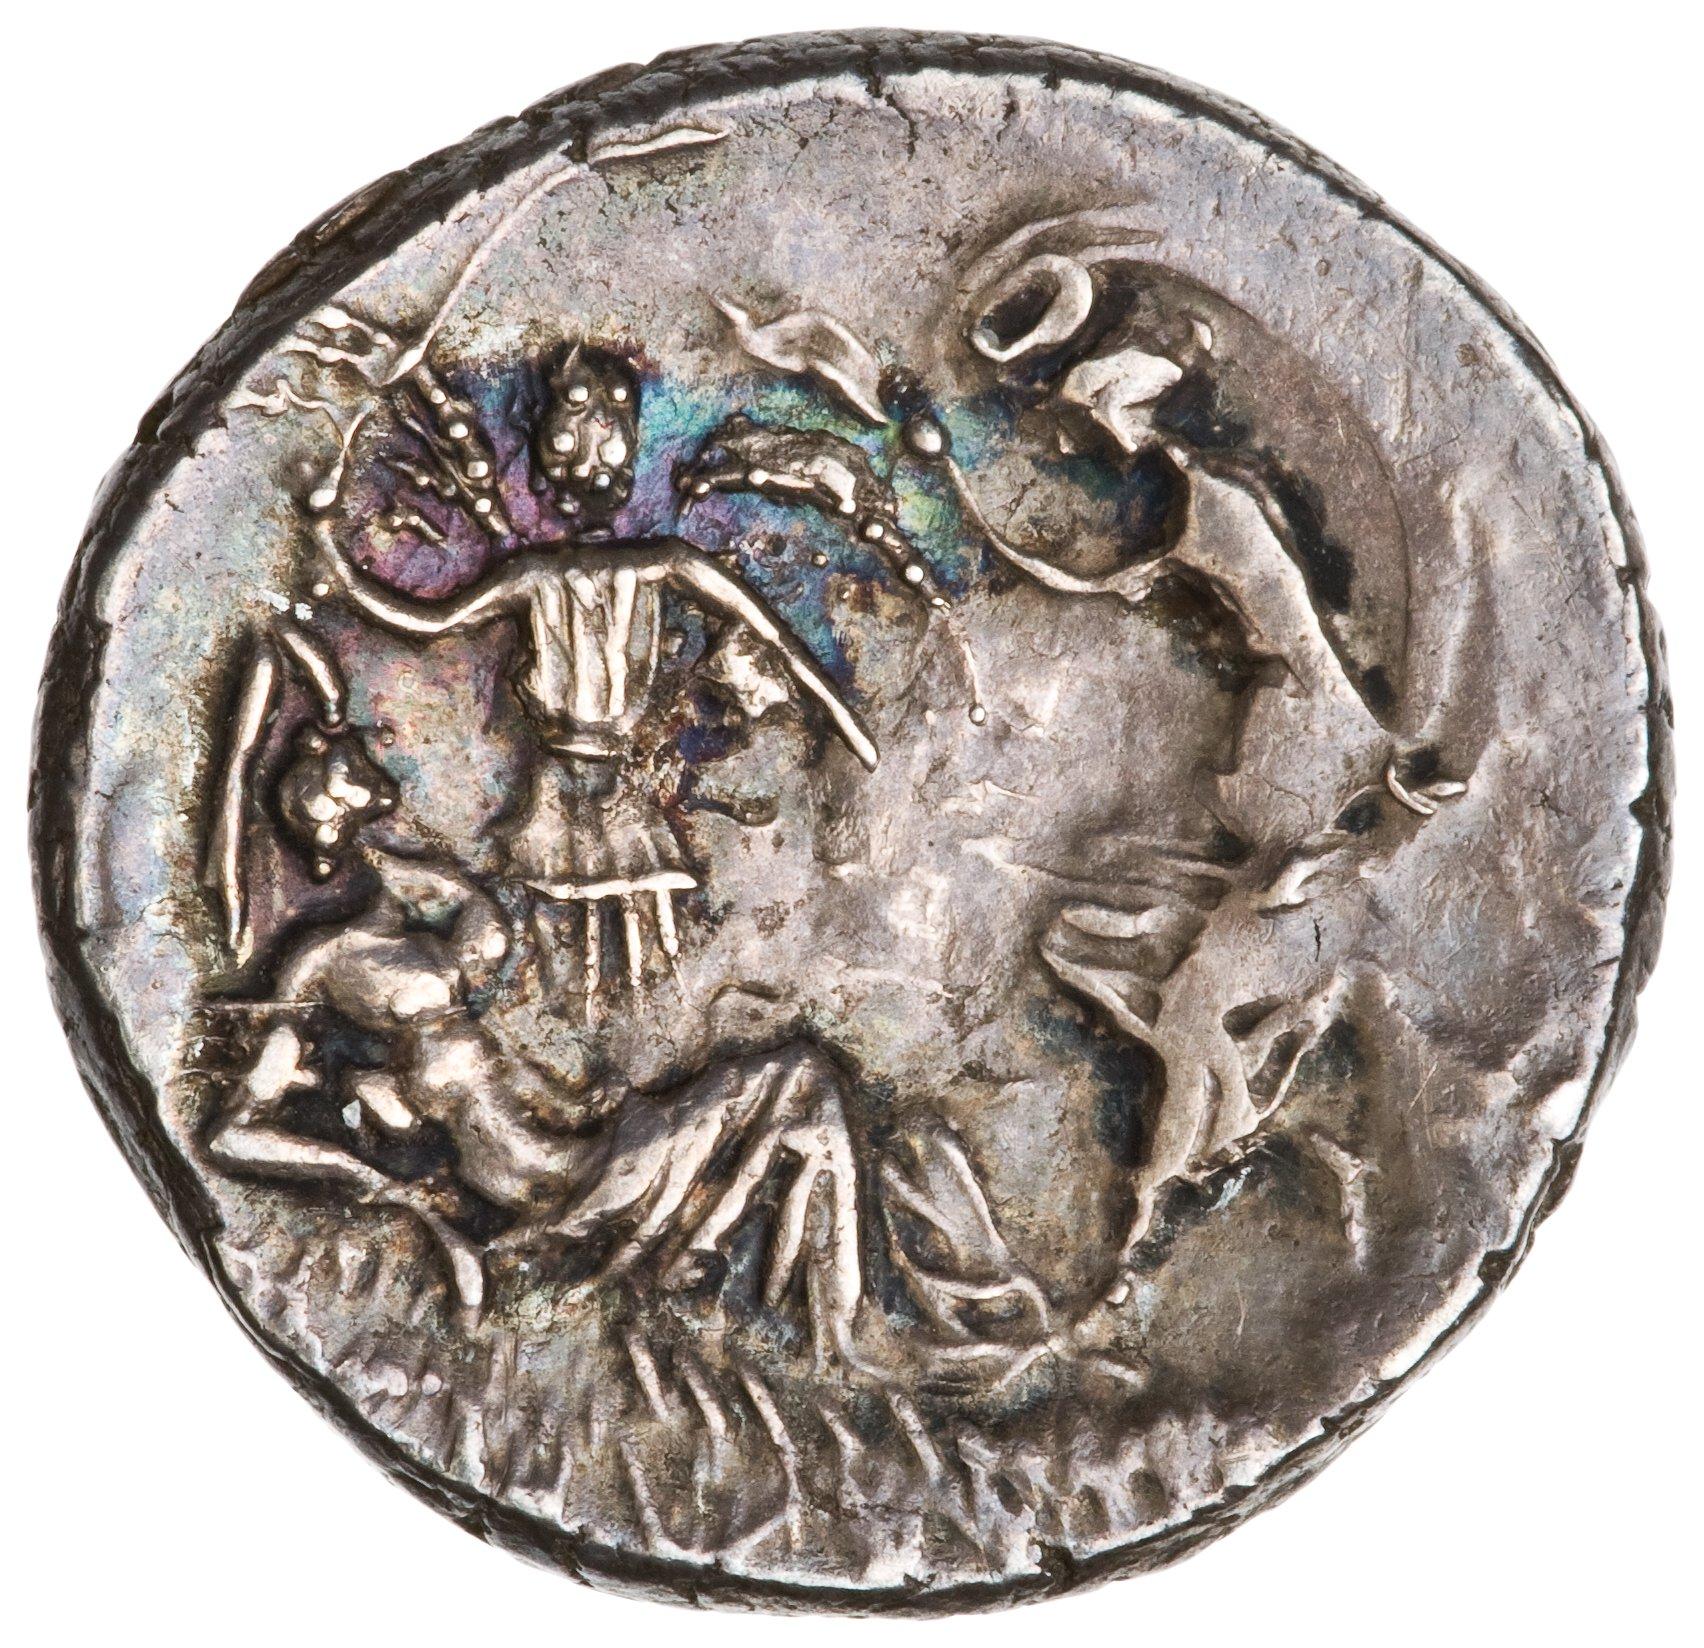 https://i1.wp.com/numismatics.org/collectionimages/19001949/1944/1944.100.3607.rev.noscale.jpg